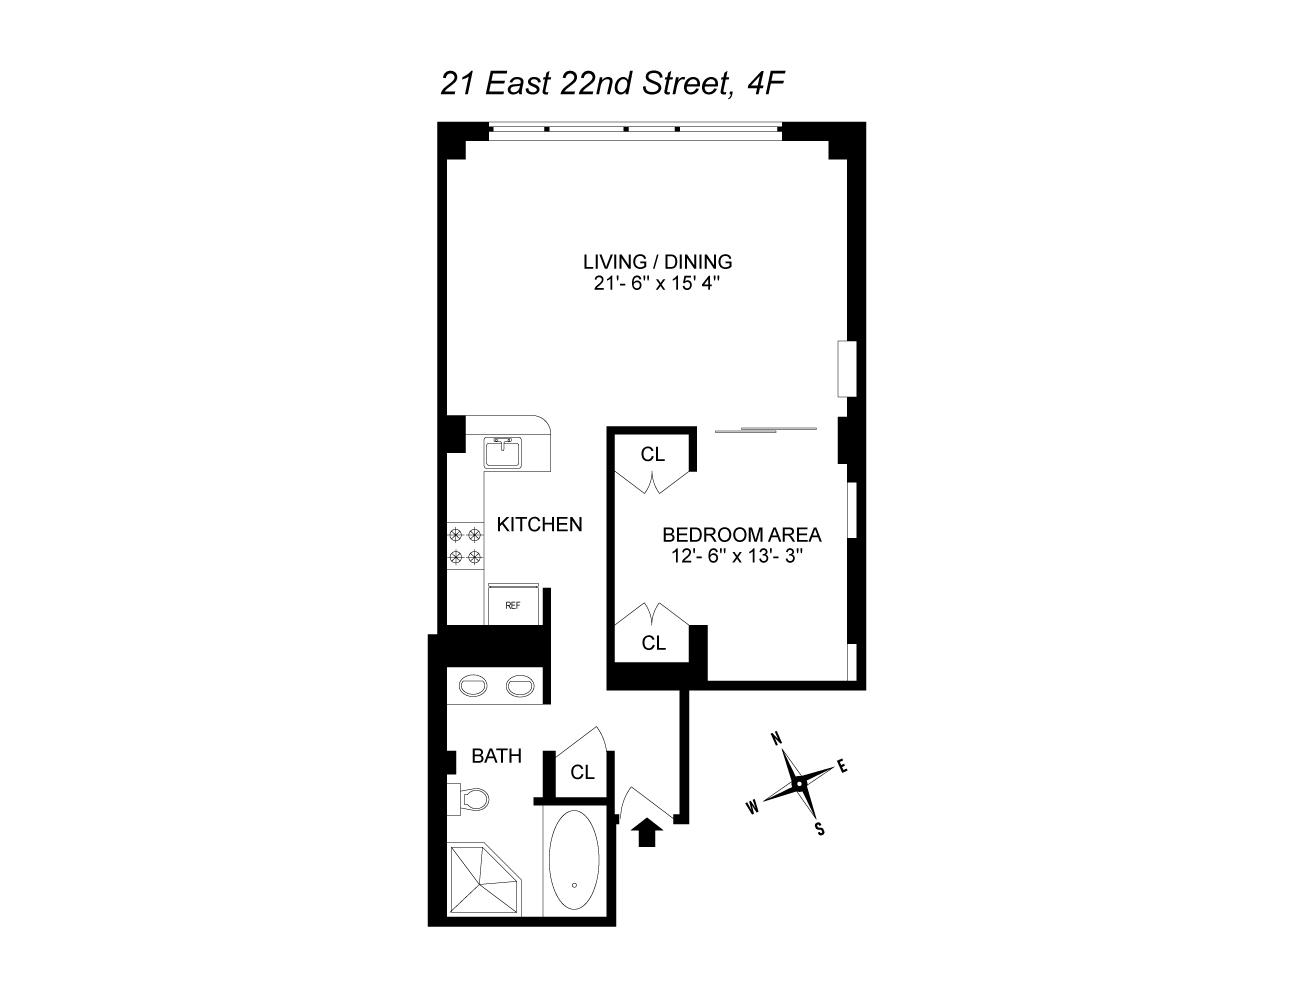 21 East 22nd Street Flatiron District New York NY 10010